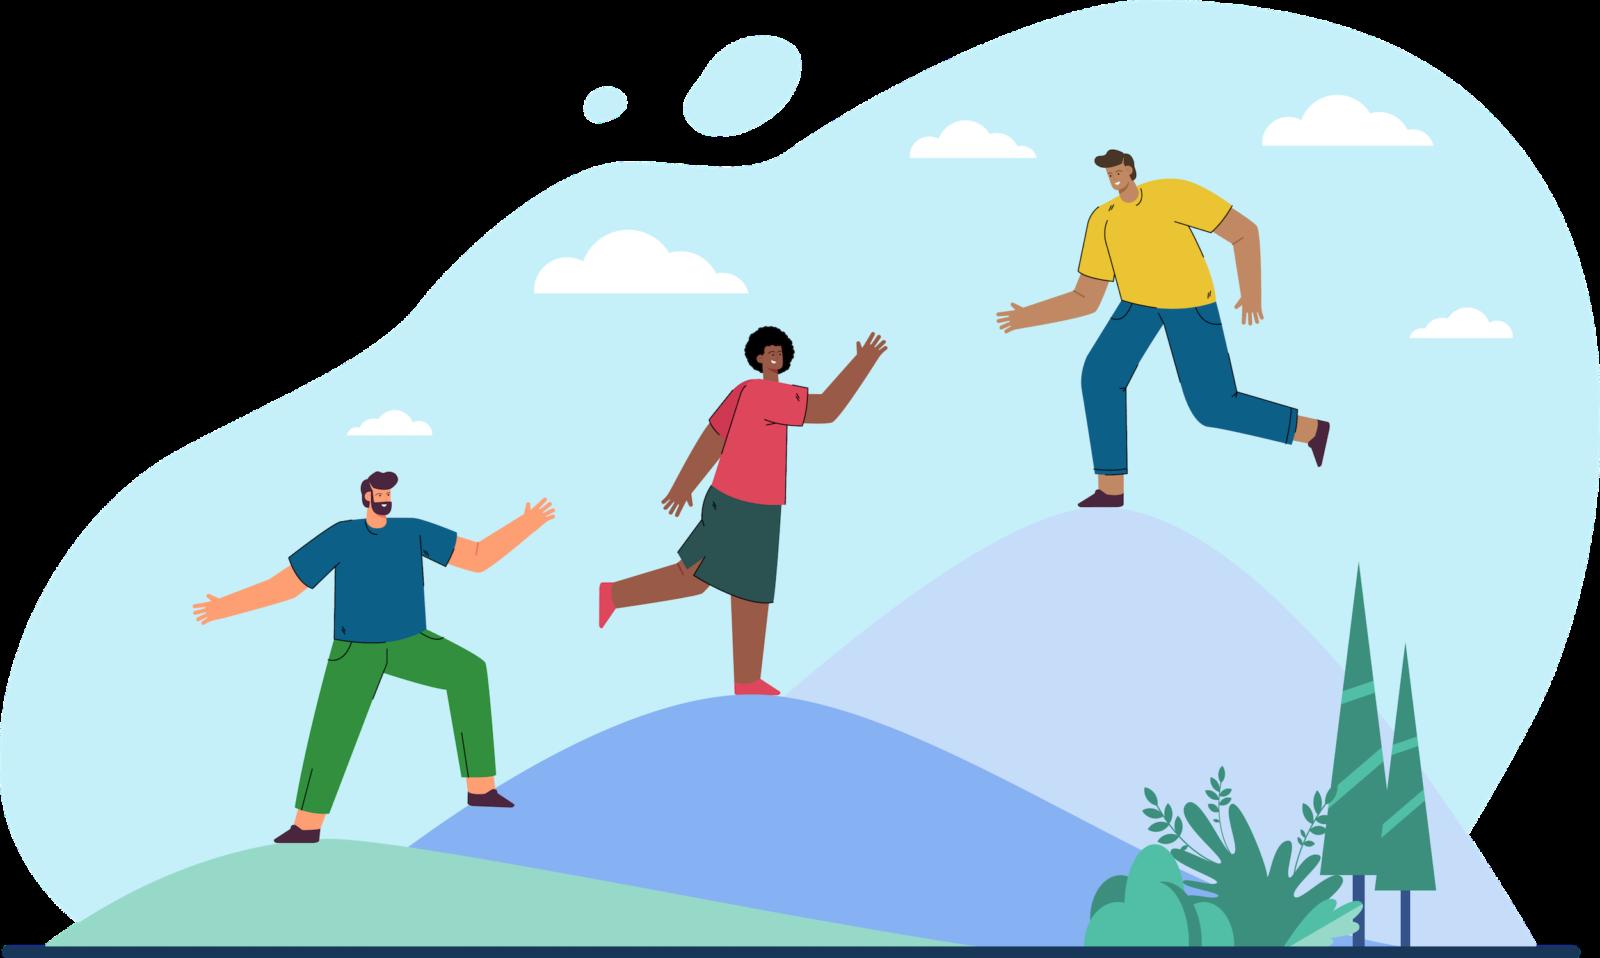 Illustration of three people climbing mountains